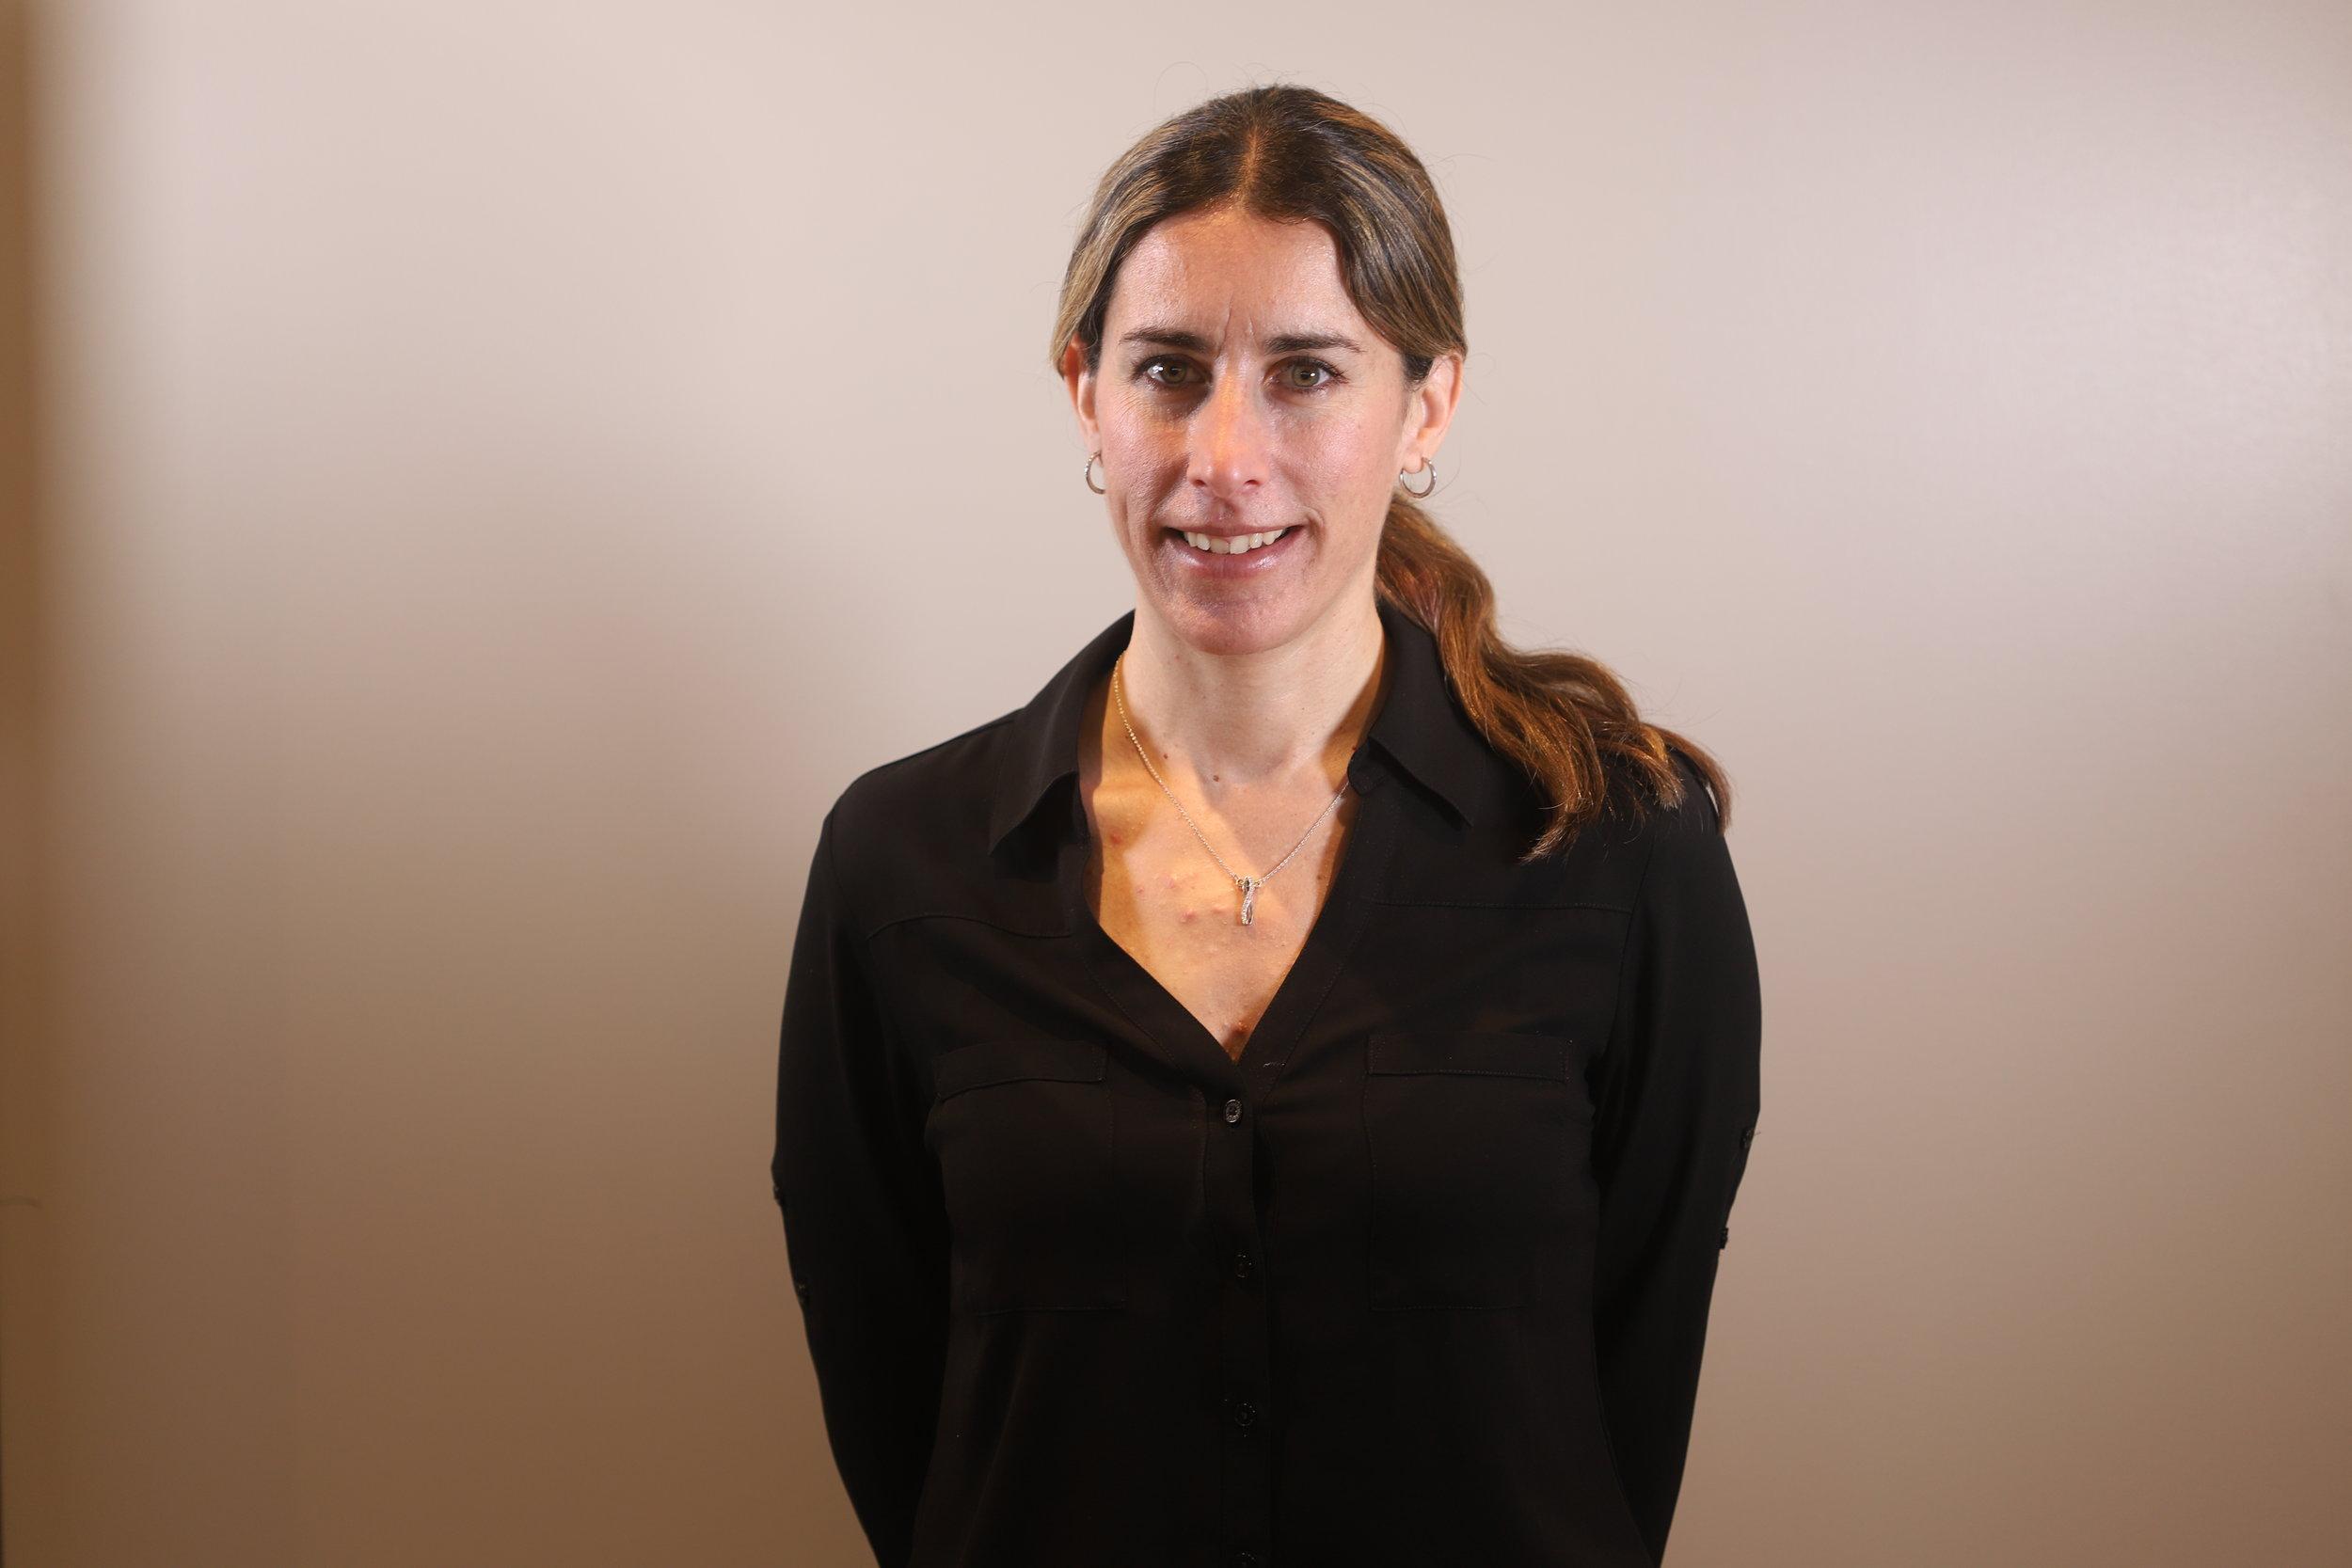 Rebecca Sanchez, Board Member Since 2016